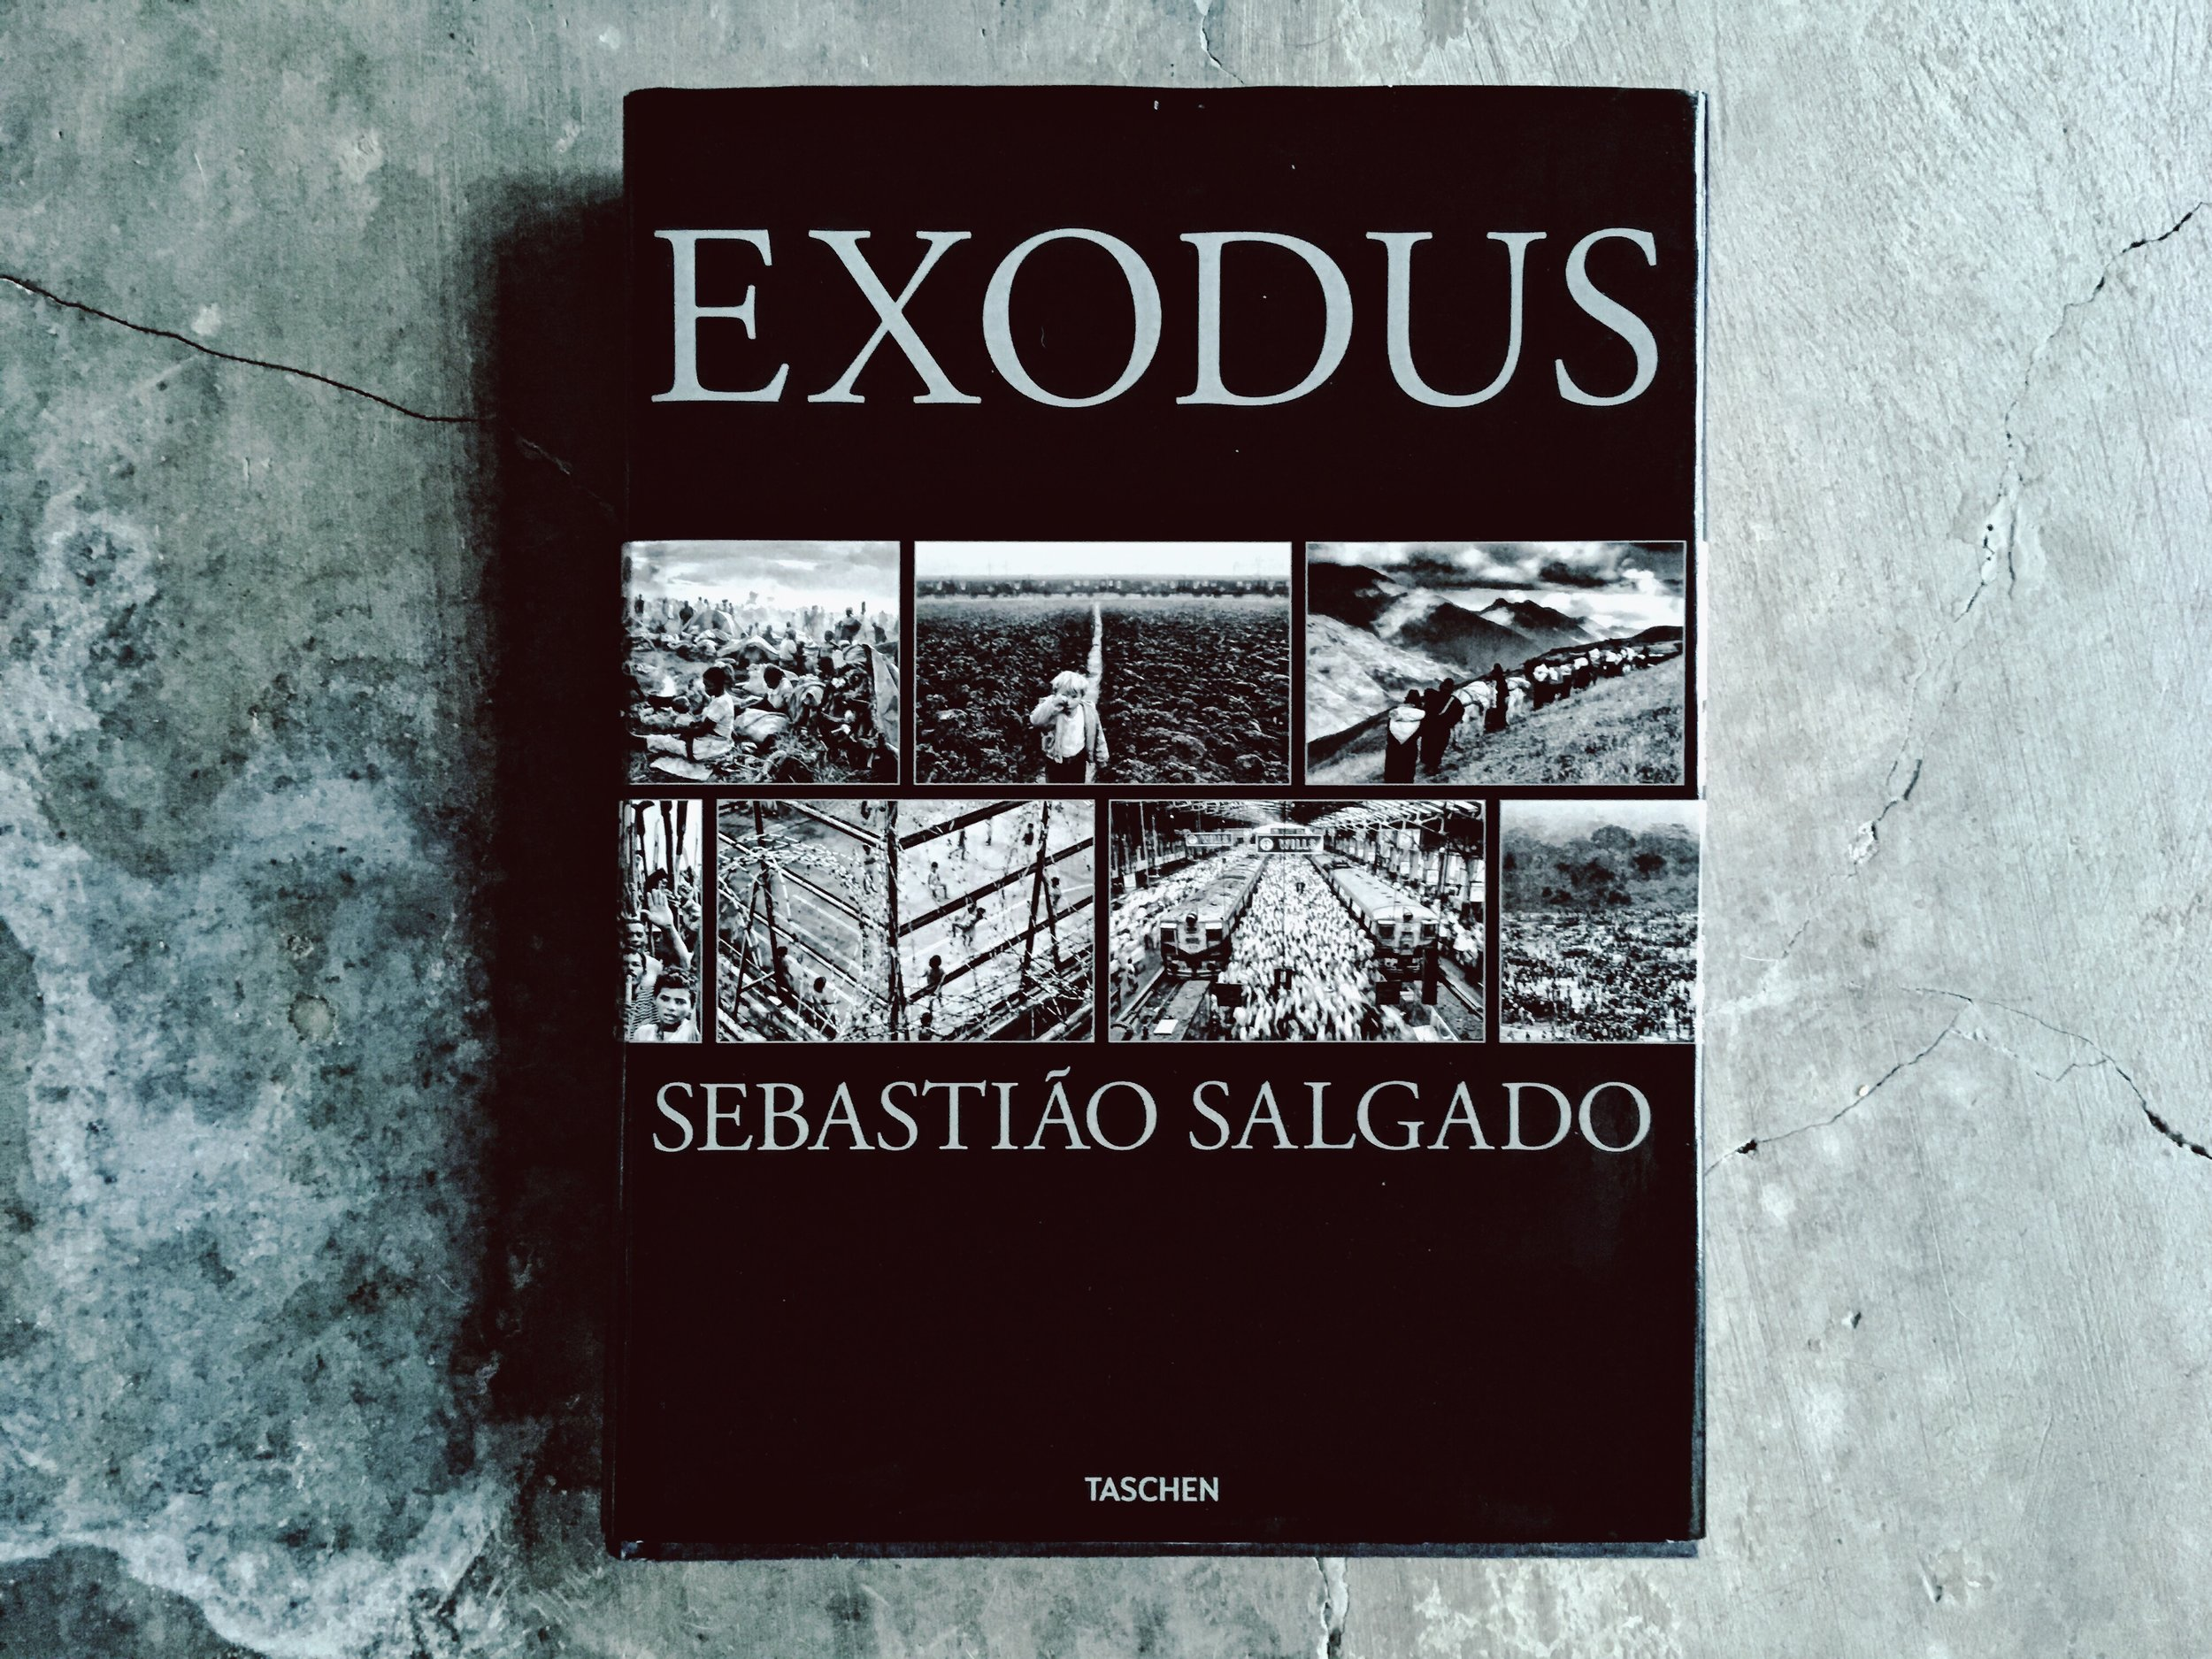 An image of the book Exodus by Sebastiao Salgado